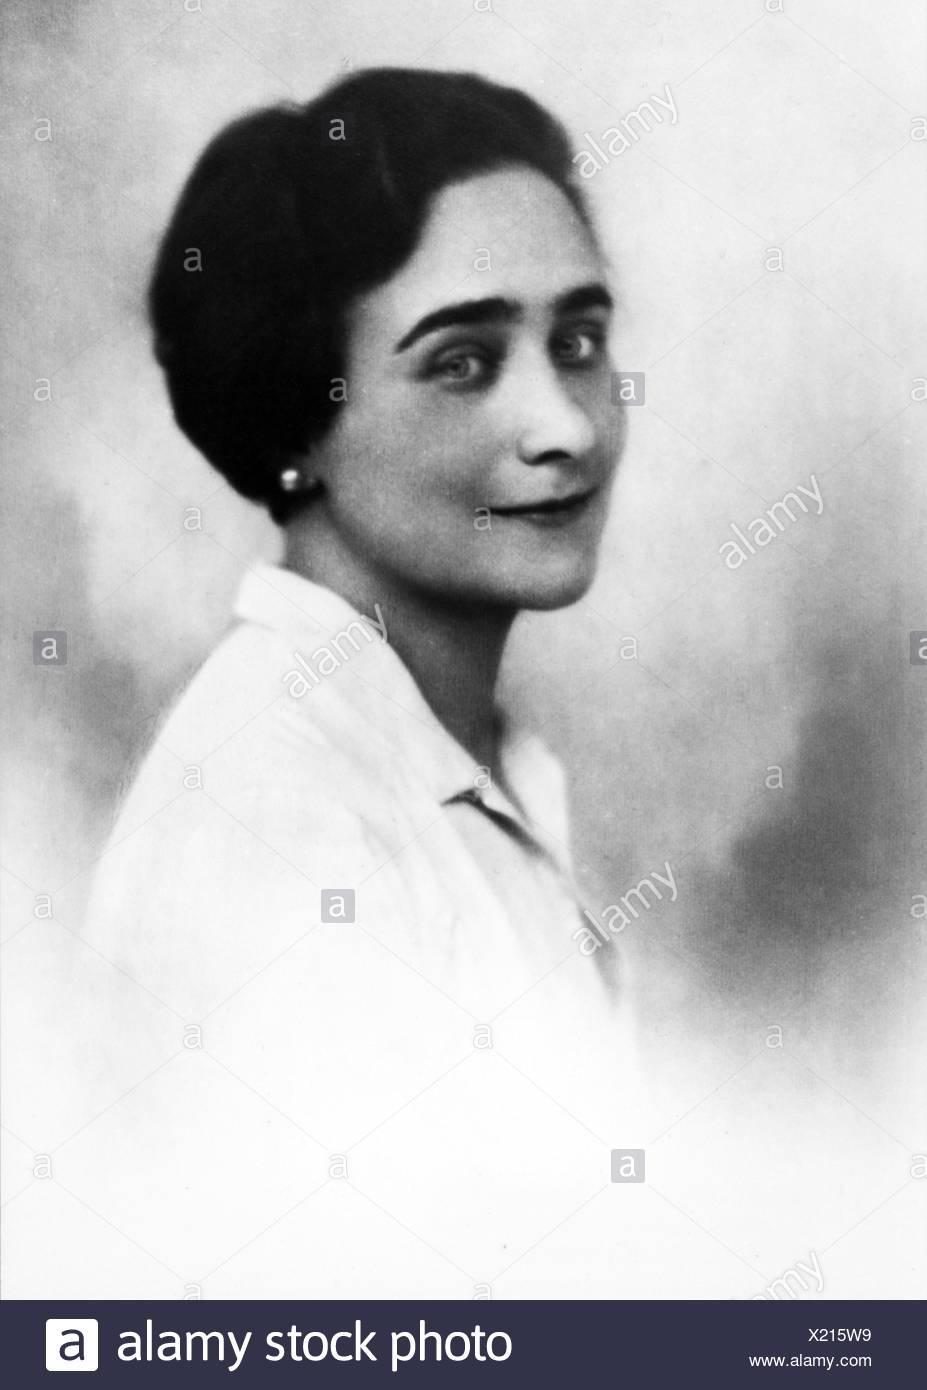 Tergit, Gabriele, 4.3.1894 - 25.7.1982, German journalist and authoress / writer, portrait, 1920s, Stock Photo